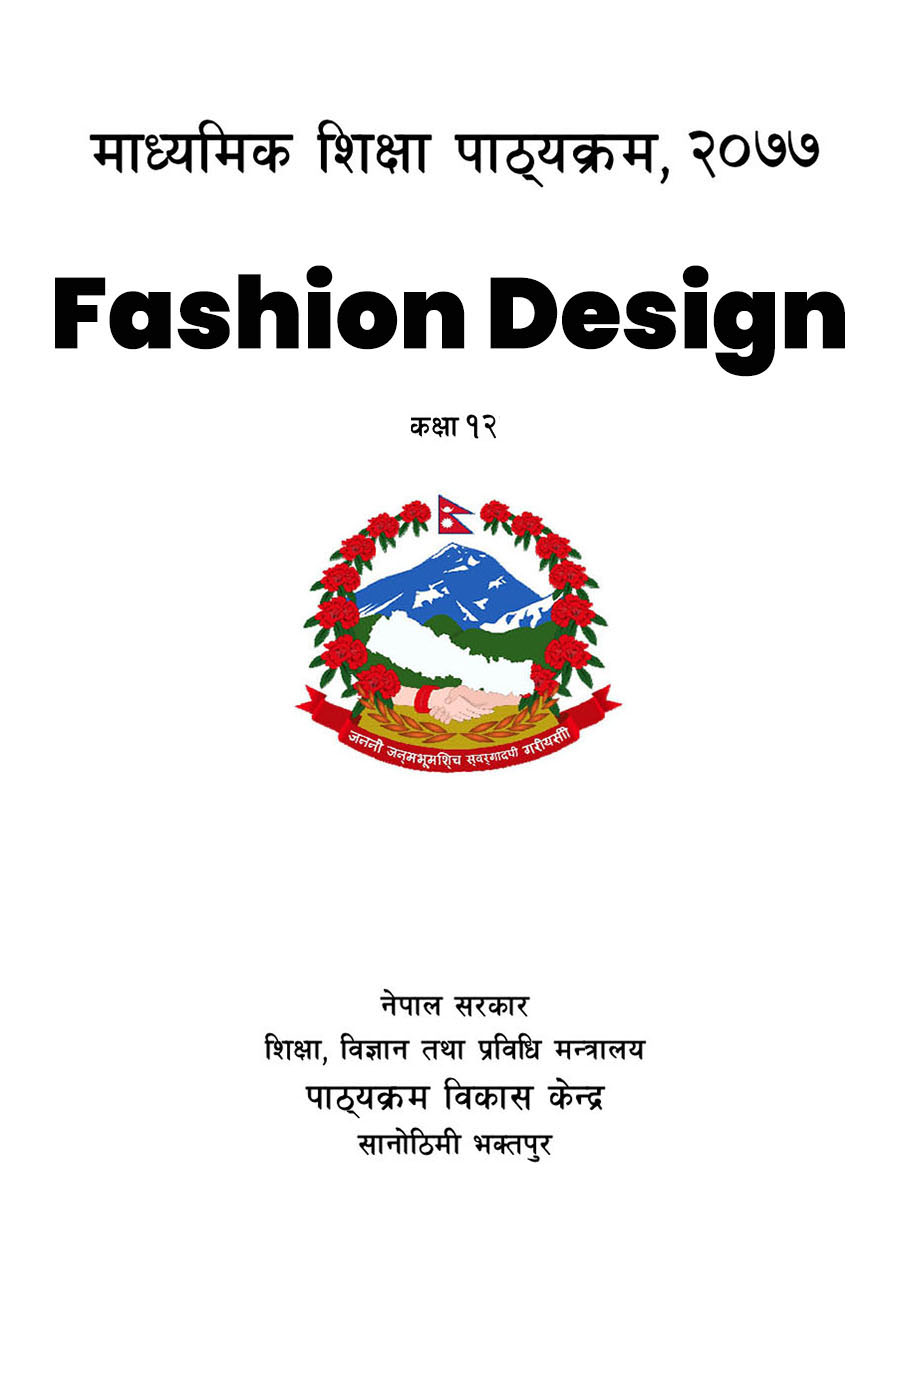 Grade-12-XII-Fashion-Design-Curriculum-Subject-Code-Fad326-2077-DOWNLOAD-in-PDF